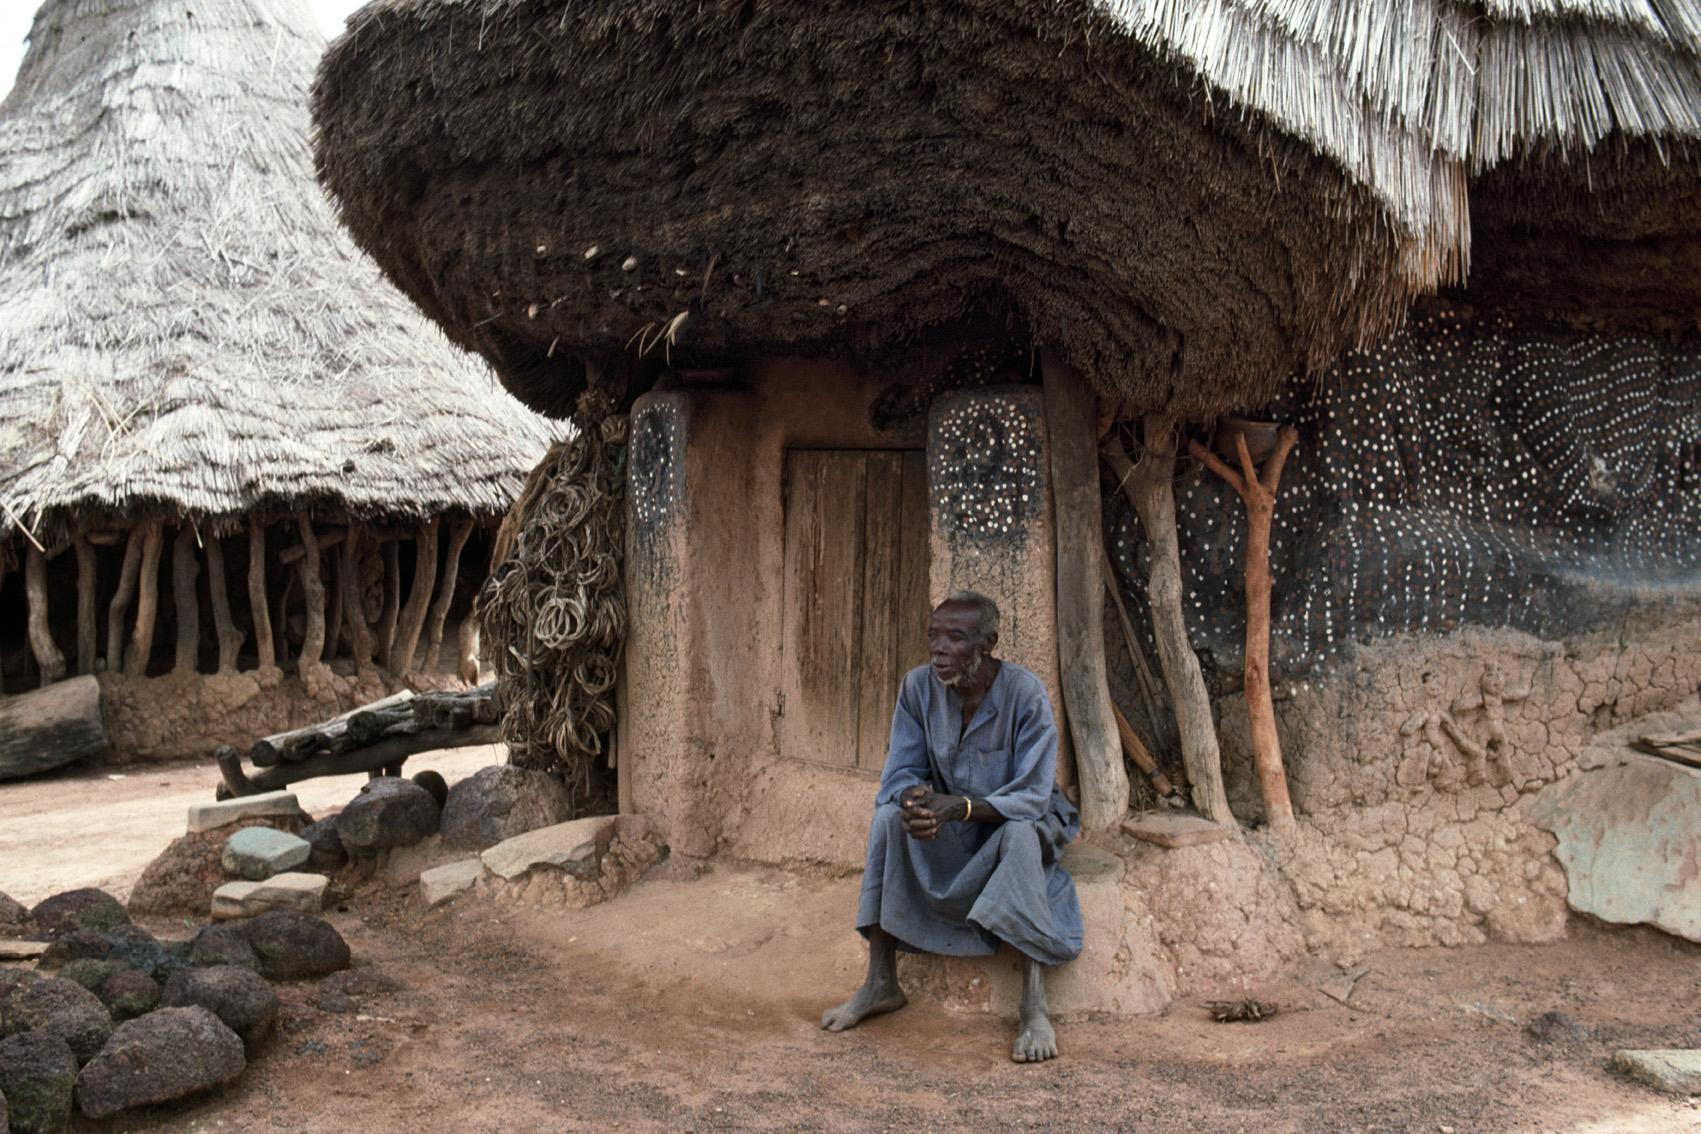 Dogon village, Mali 1993